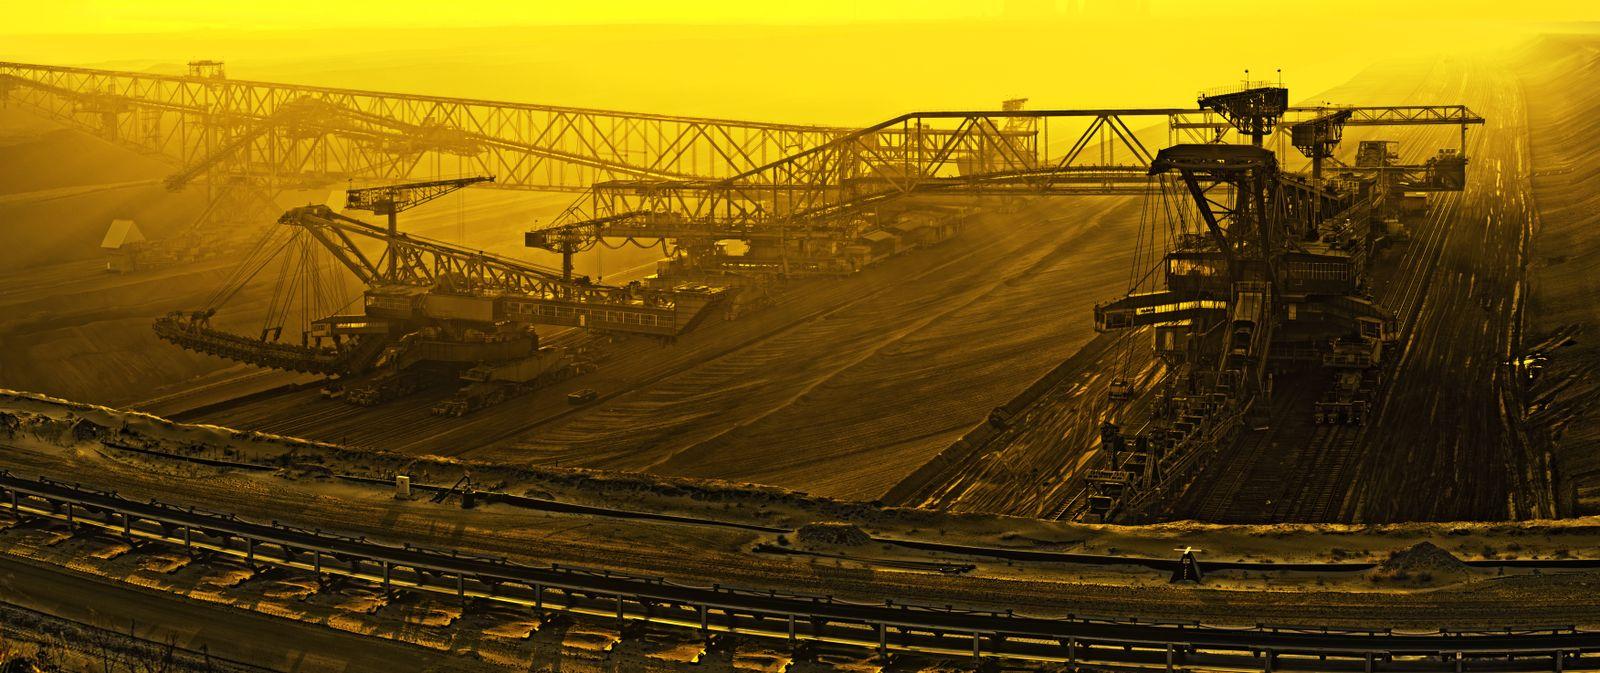 EINMALIGE VERWENDUNG Symbolbild Klima/ Klimaschutz/ Klimaerwärmung/ Kohlekraft/ Kohle/ Kohlekraftwerk